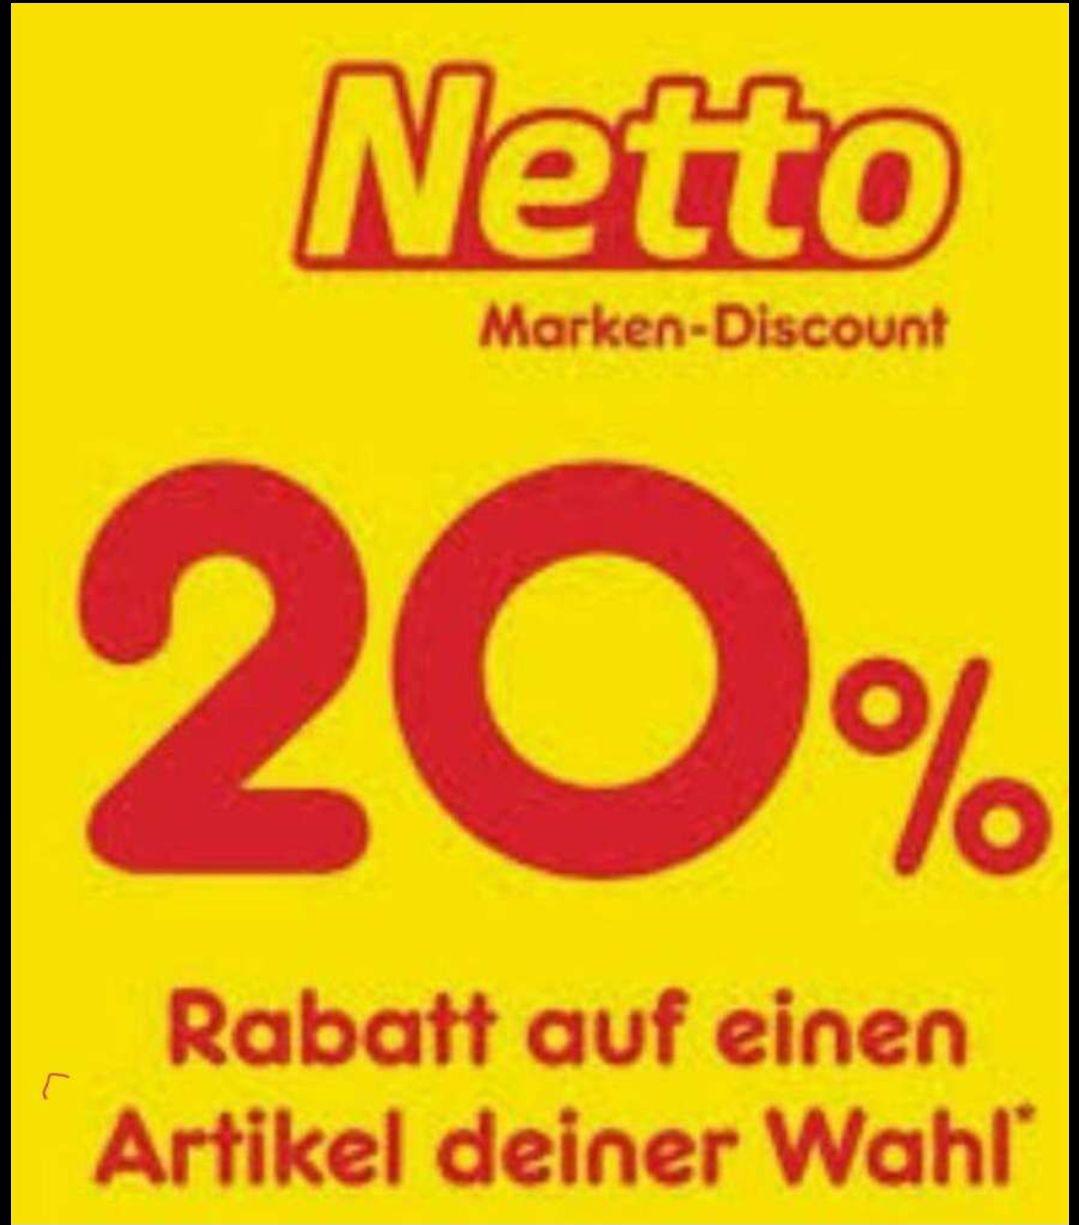 [Netto MD] Rabatt Coupons KW16 (19.04. - 24.04.), bundesweit einsetzbar